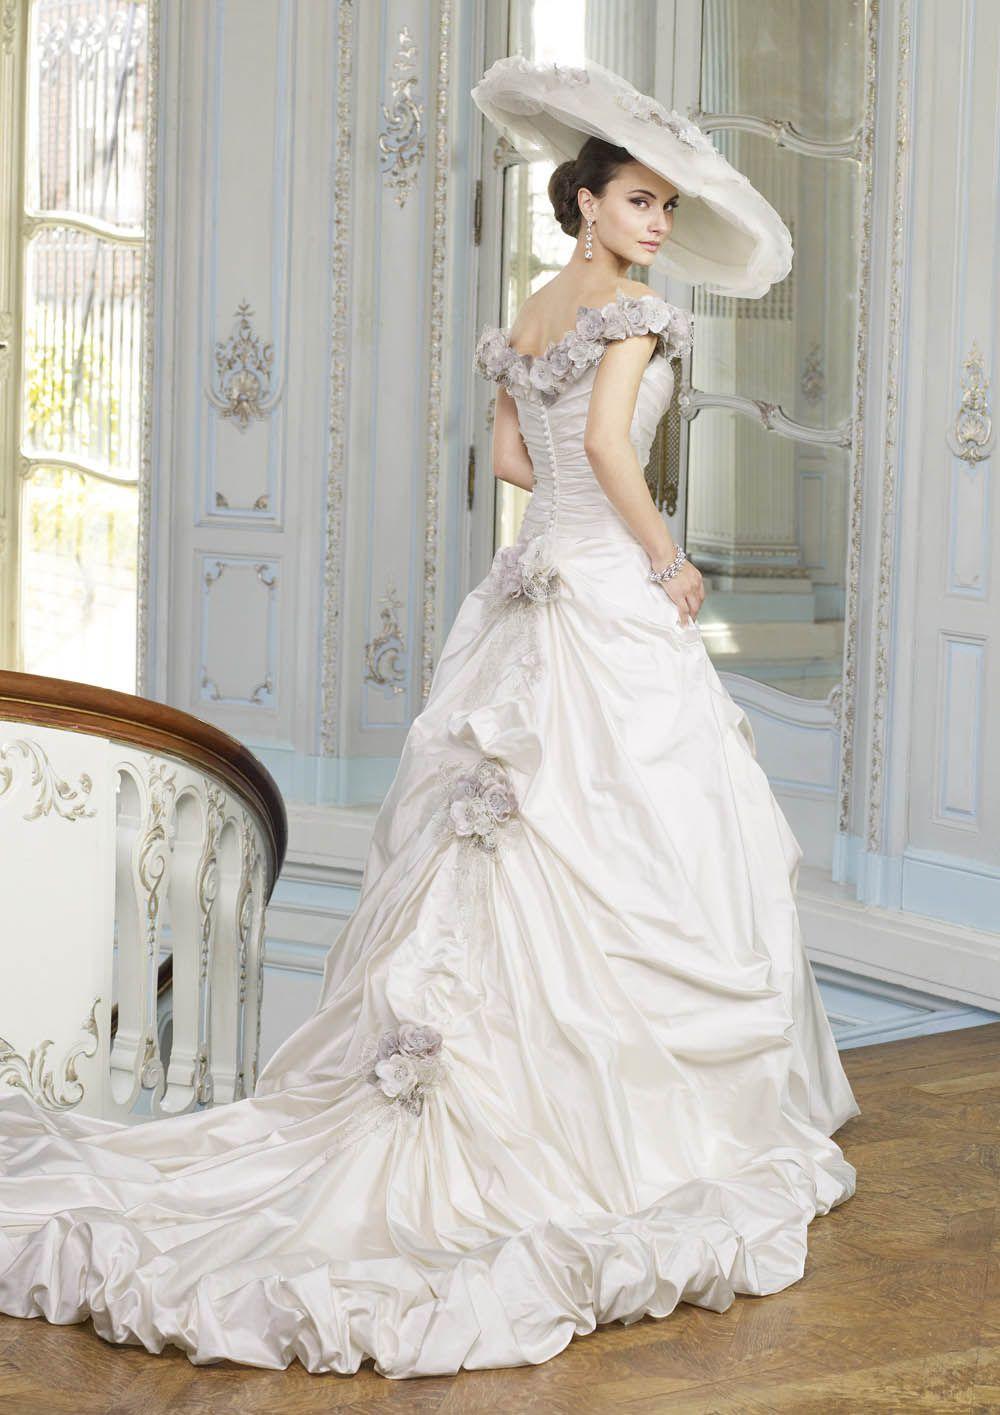 Valdisaire Ian Stuart Ball gown wedding dress, Bridal